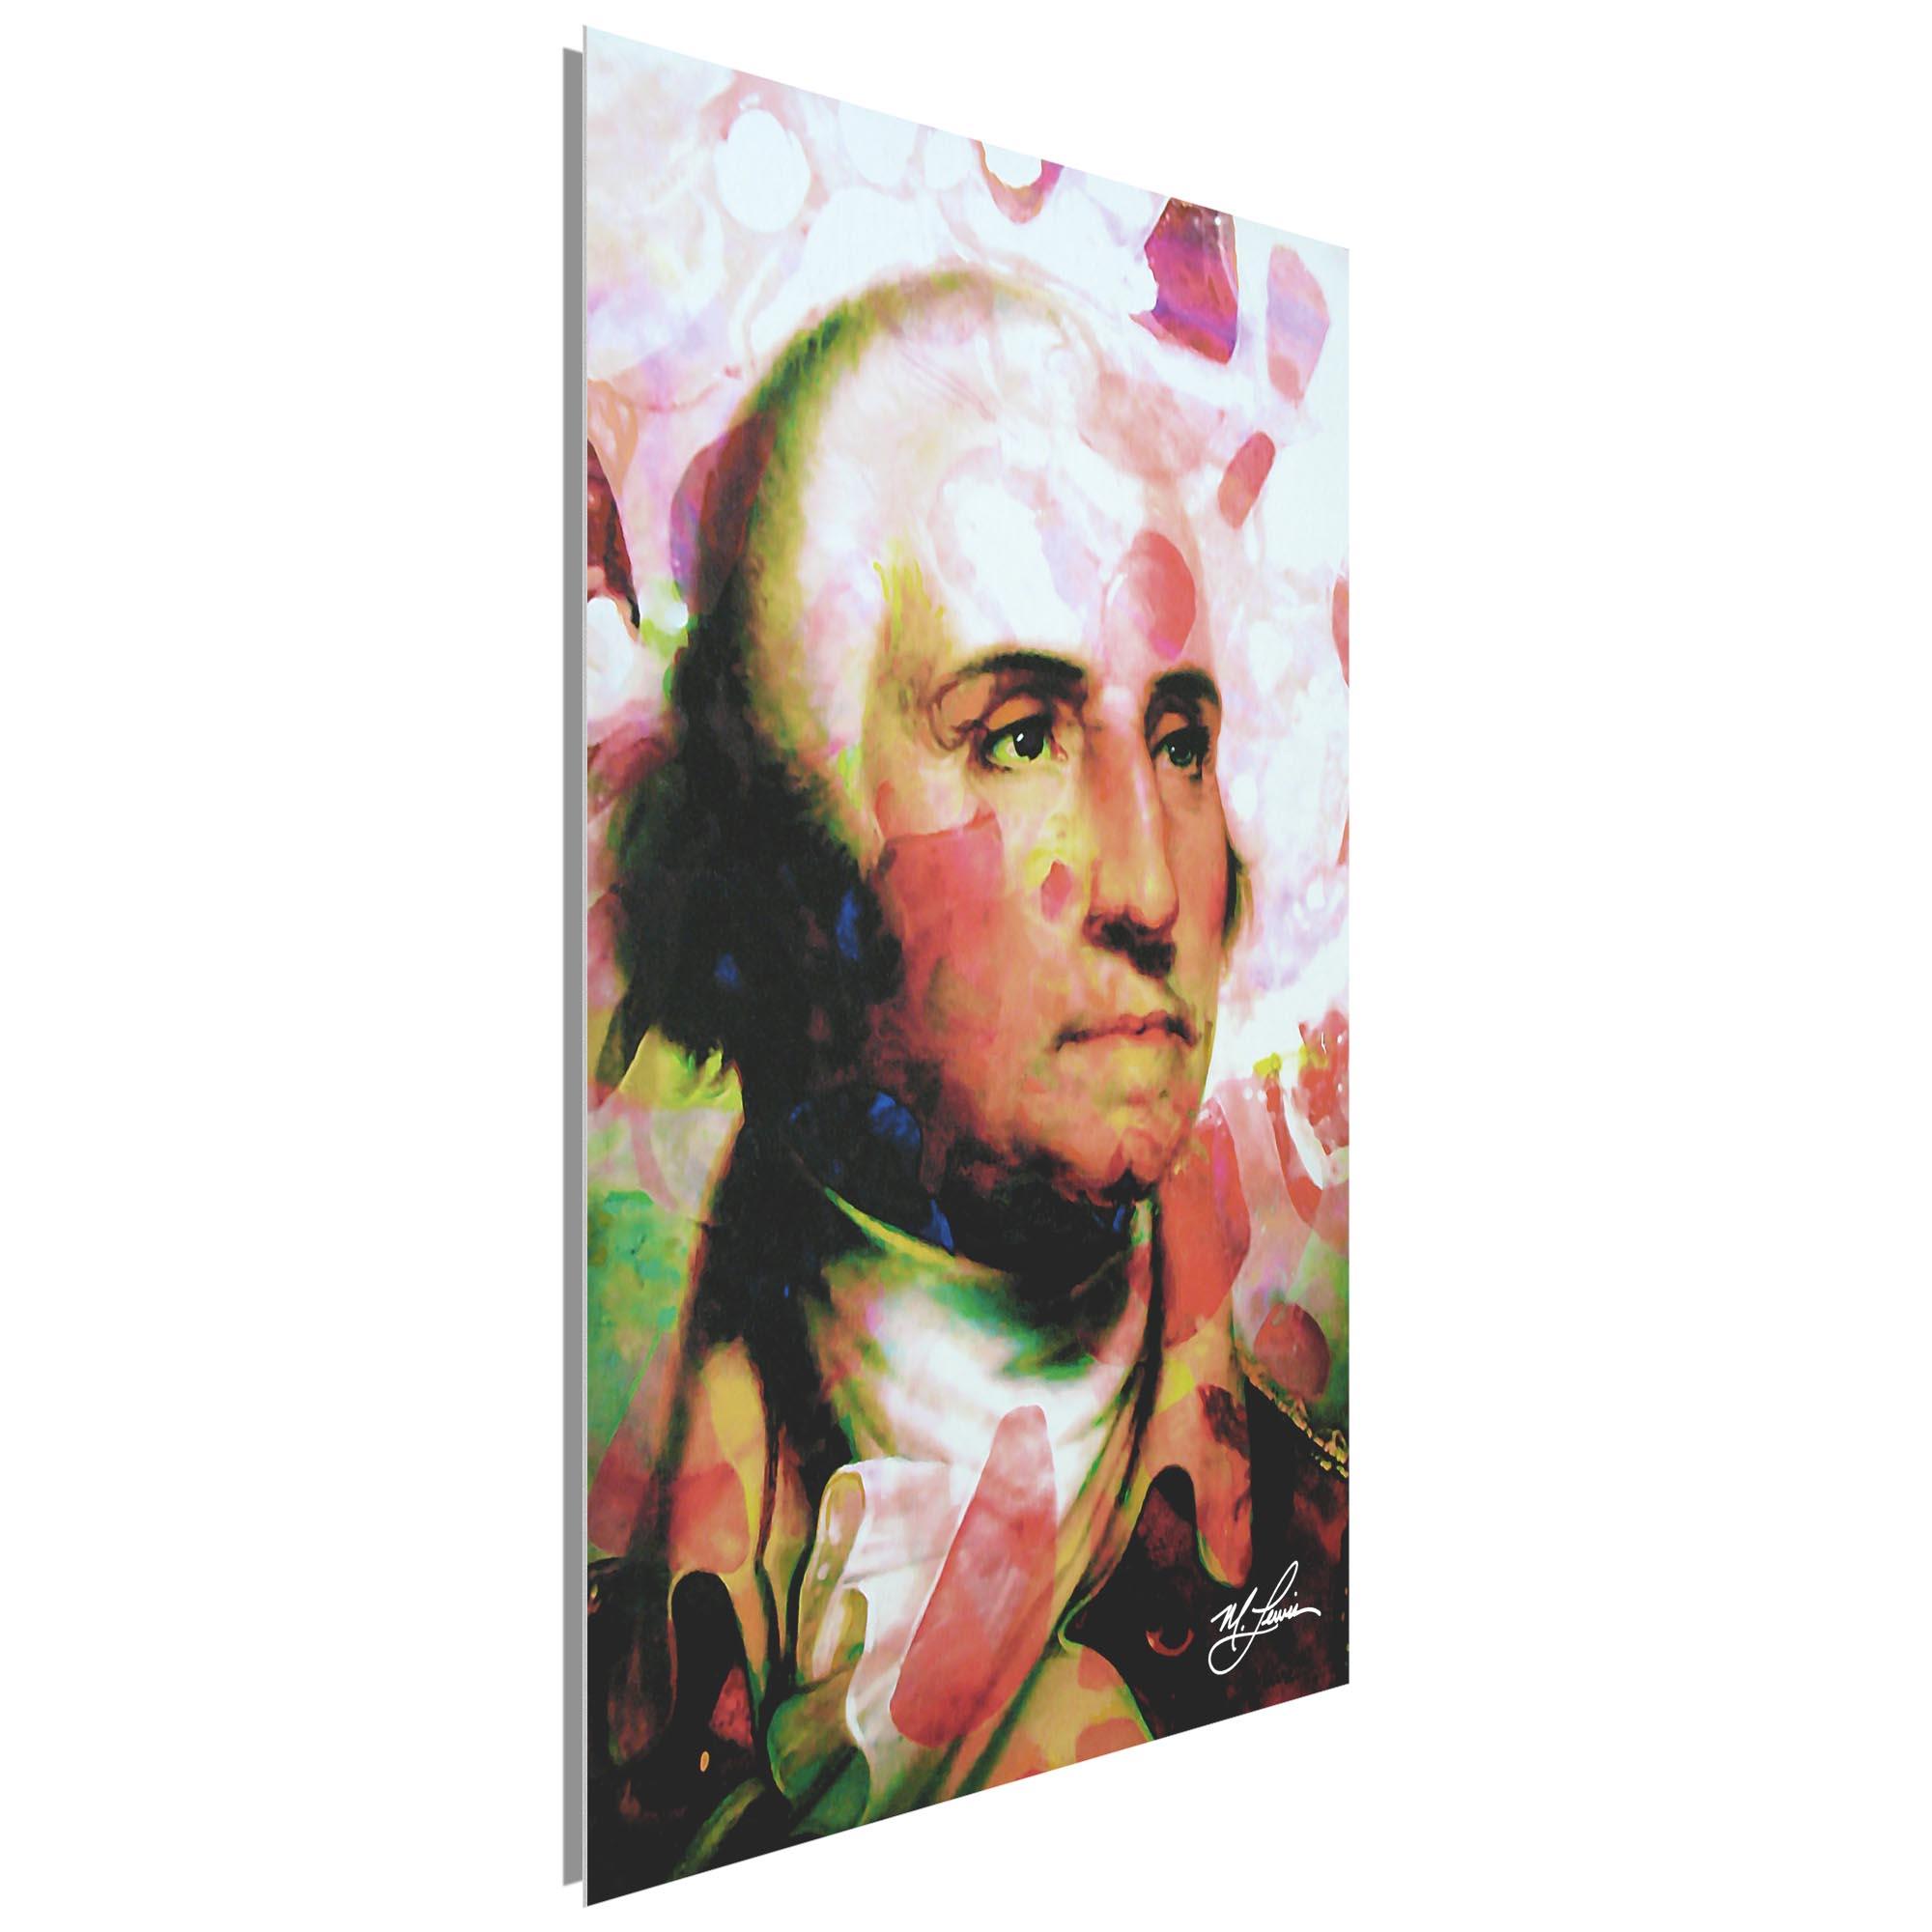 George Washington Disciplined Soul 22x32 Metal or Plexiglass Pop Art Portrait - Image 2